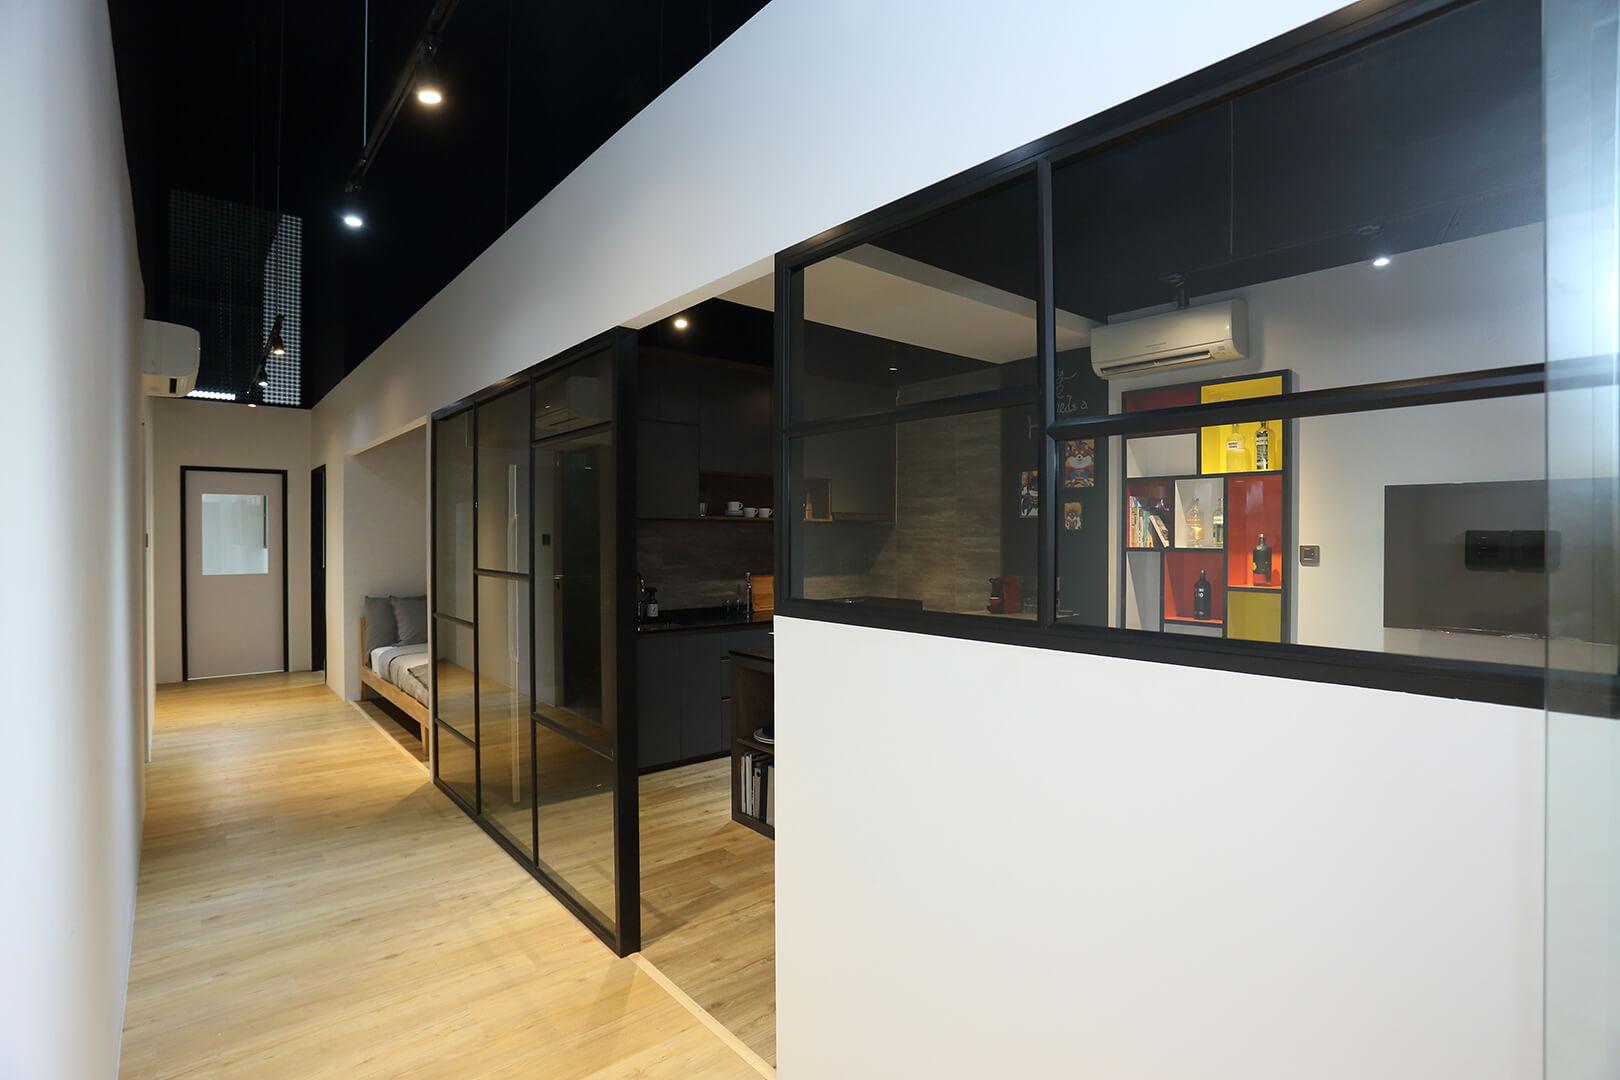 Monoloft's Design Studio Renovation Corridor with Glass Panels